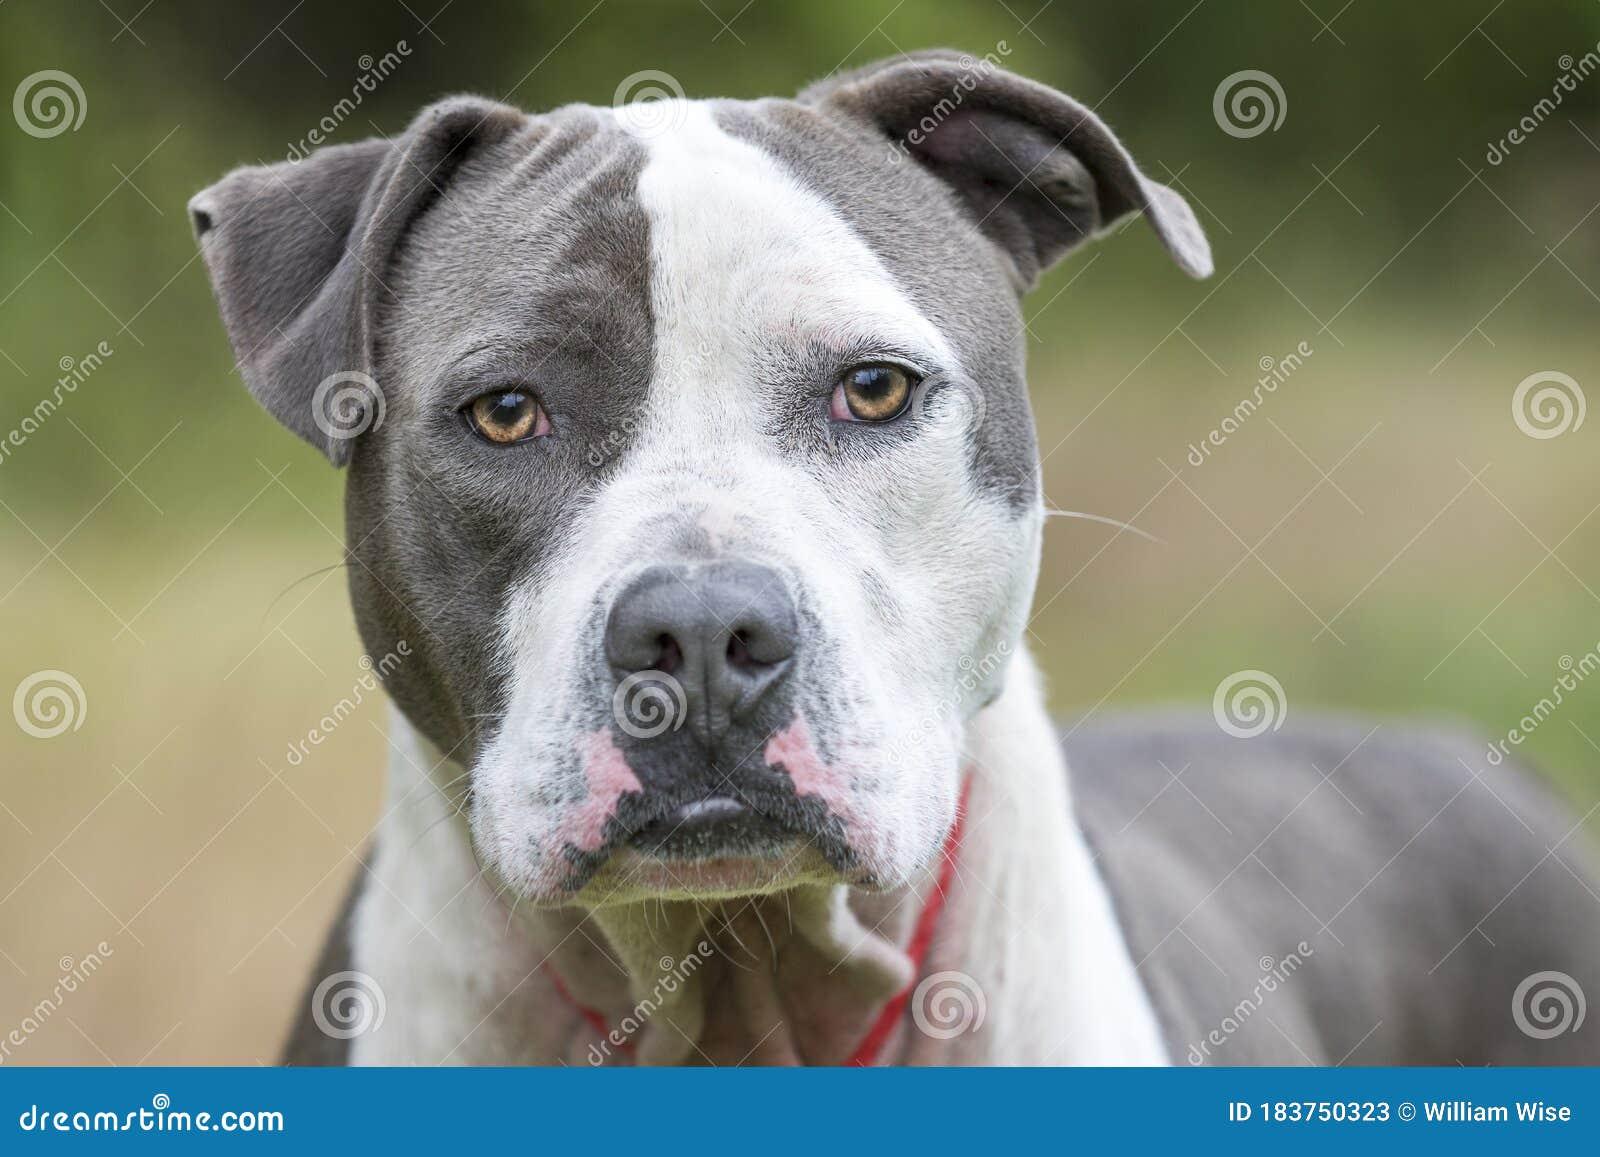 Blue Nose American Pitbull Terrier Dog Stock Image Image Of Leash Website 183750323